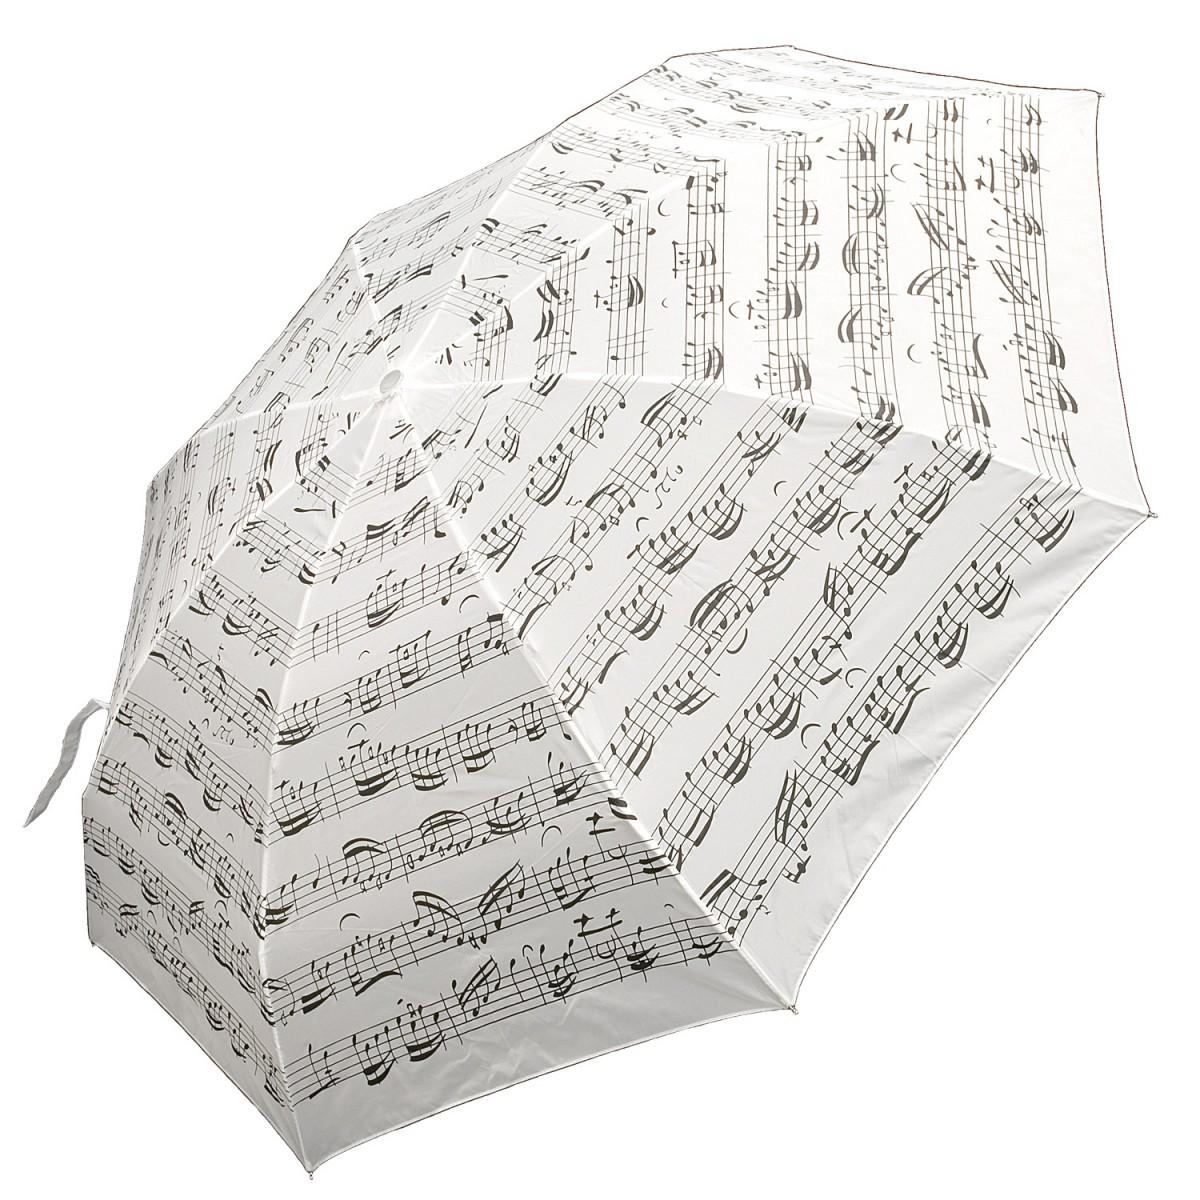 Taschen, Hosenträger, Schirme